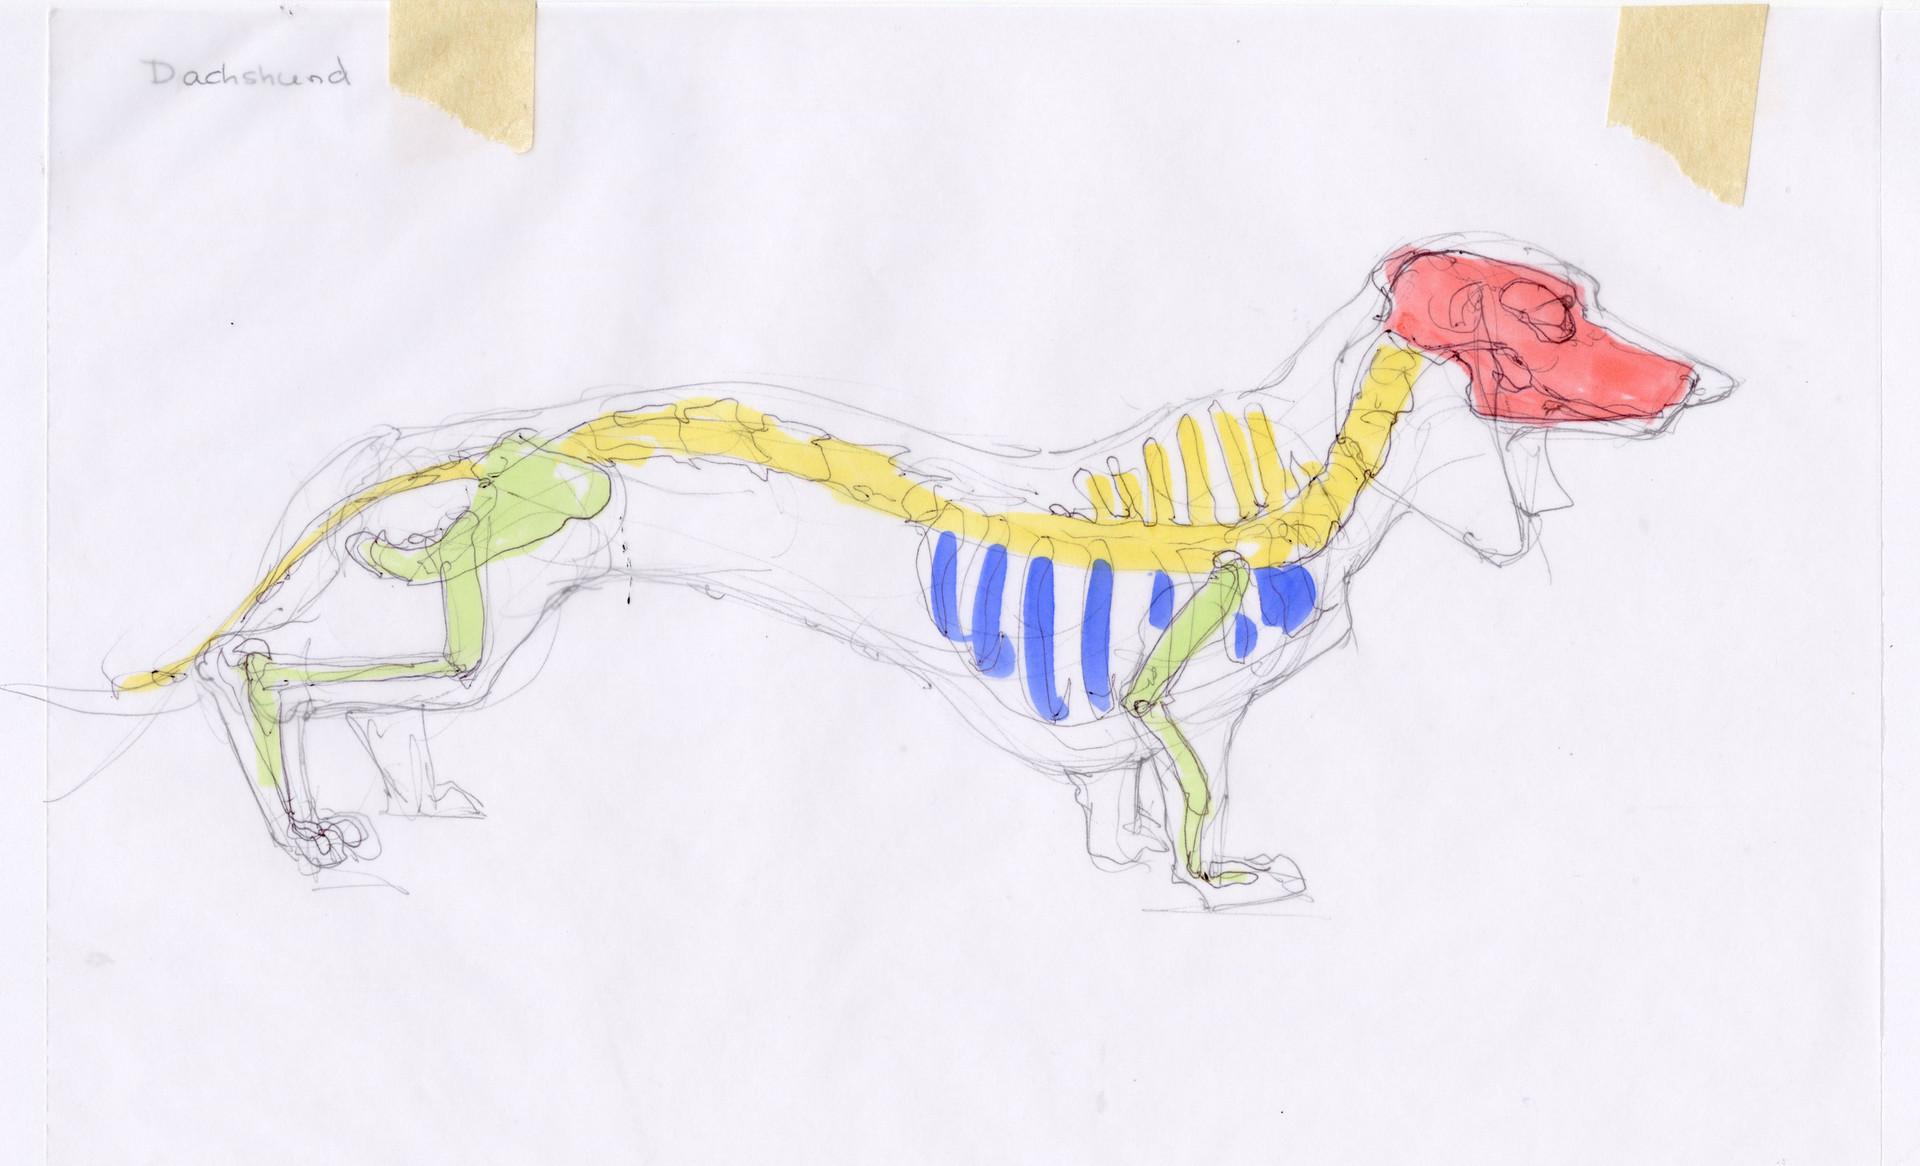 Madeline buanno skeleton07